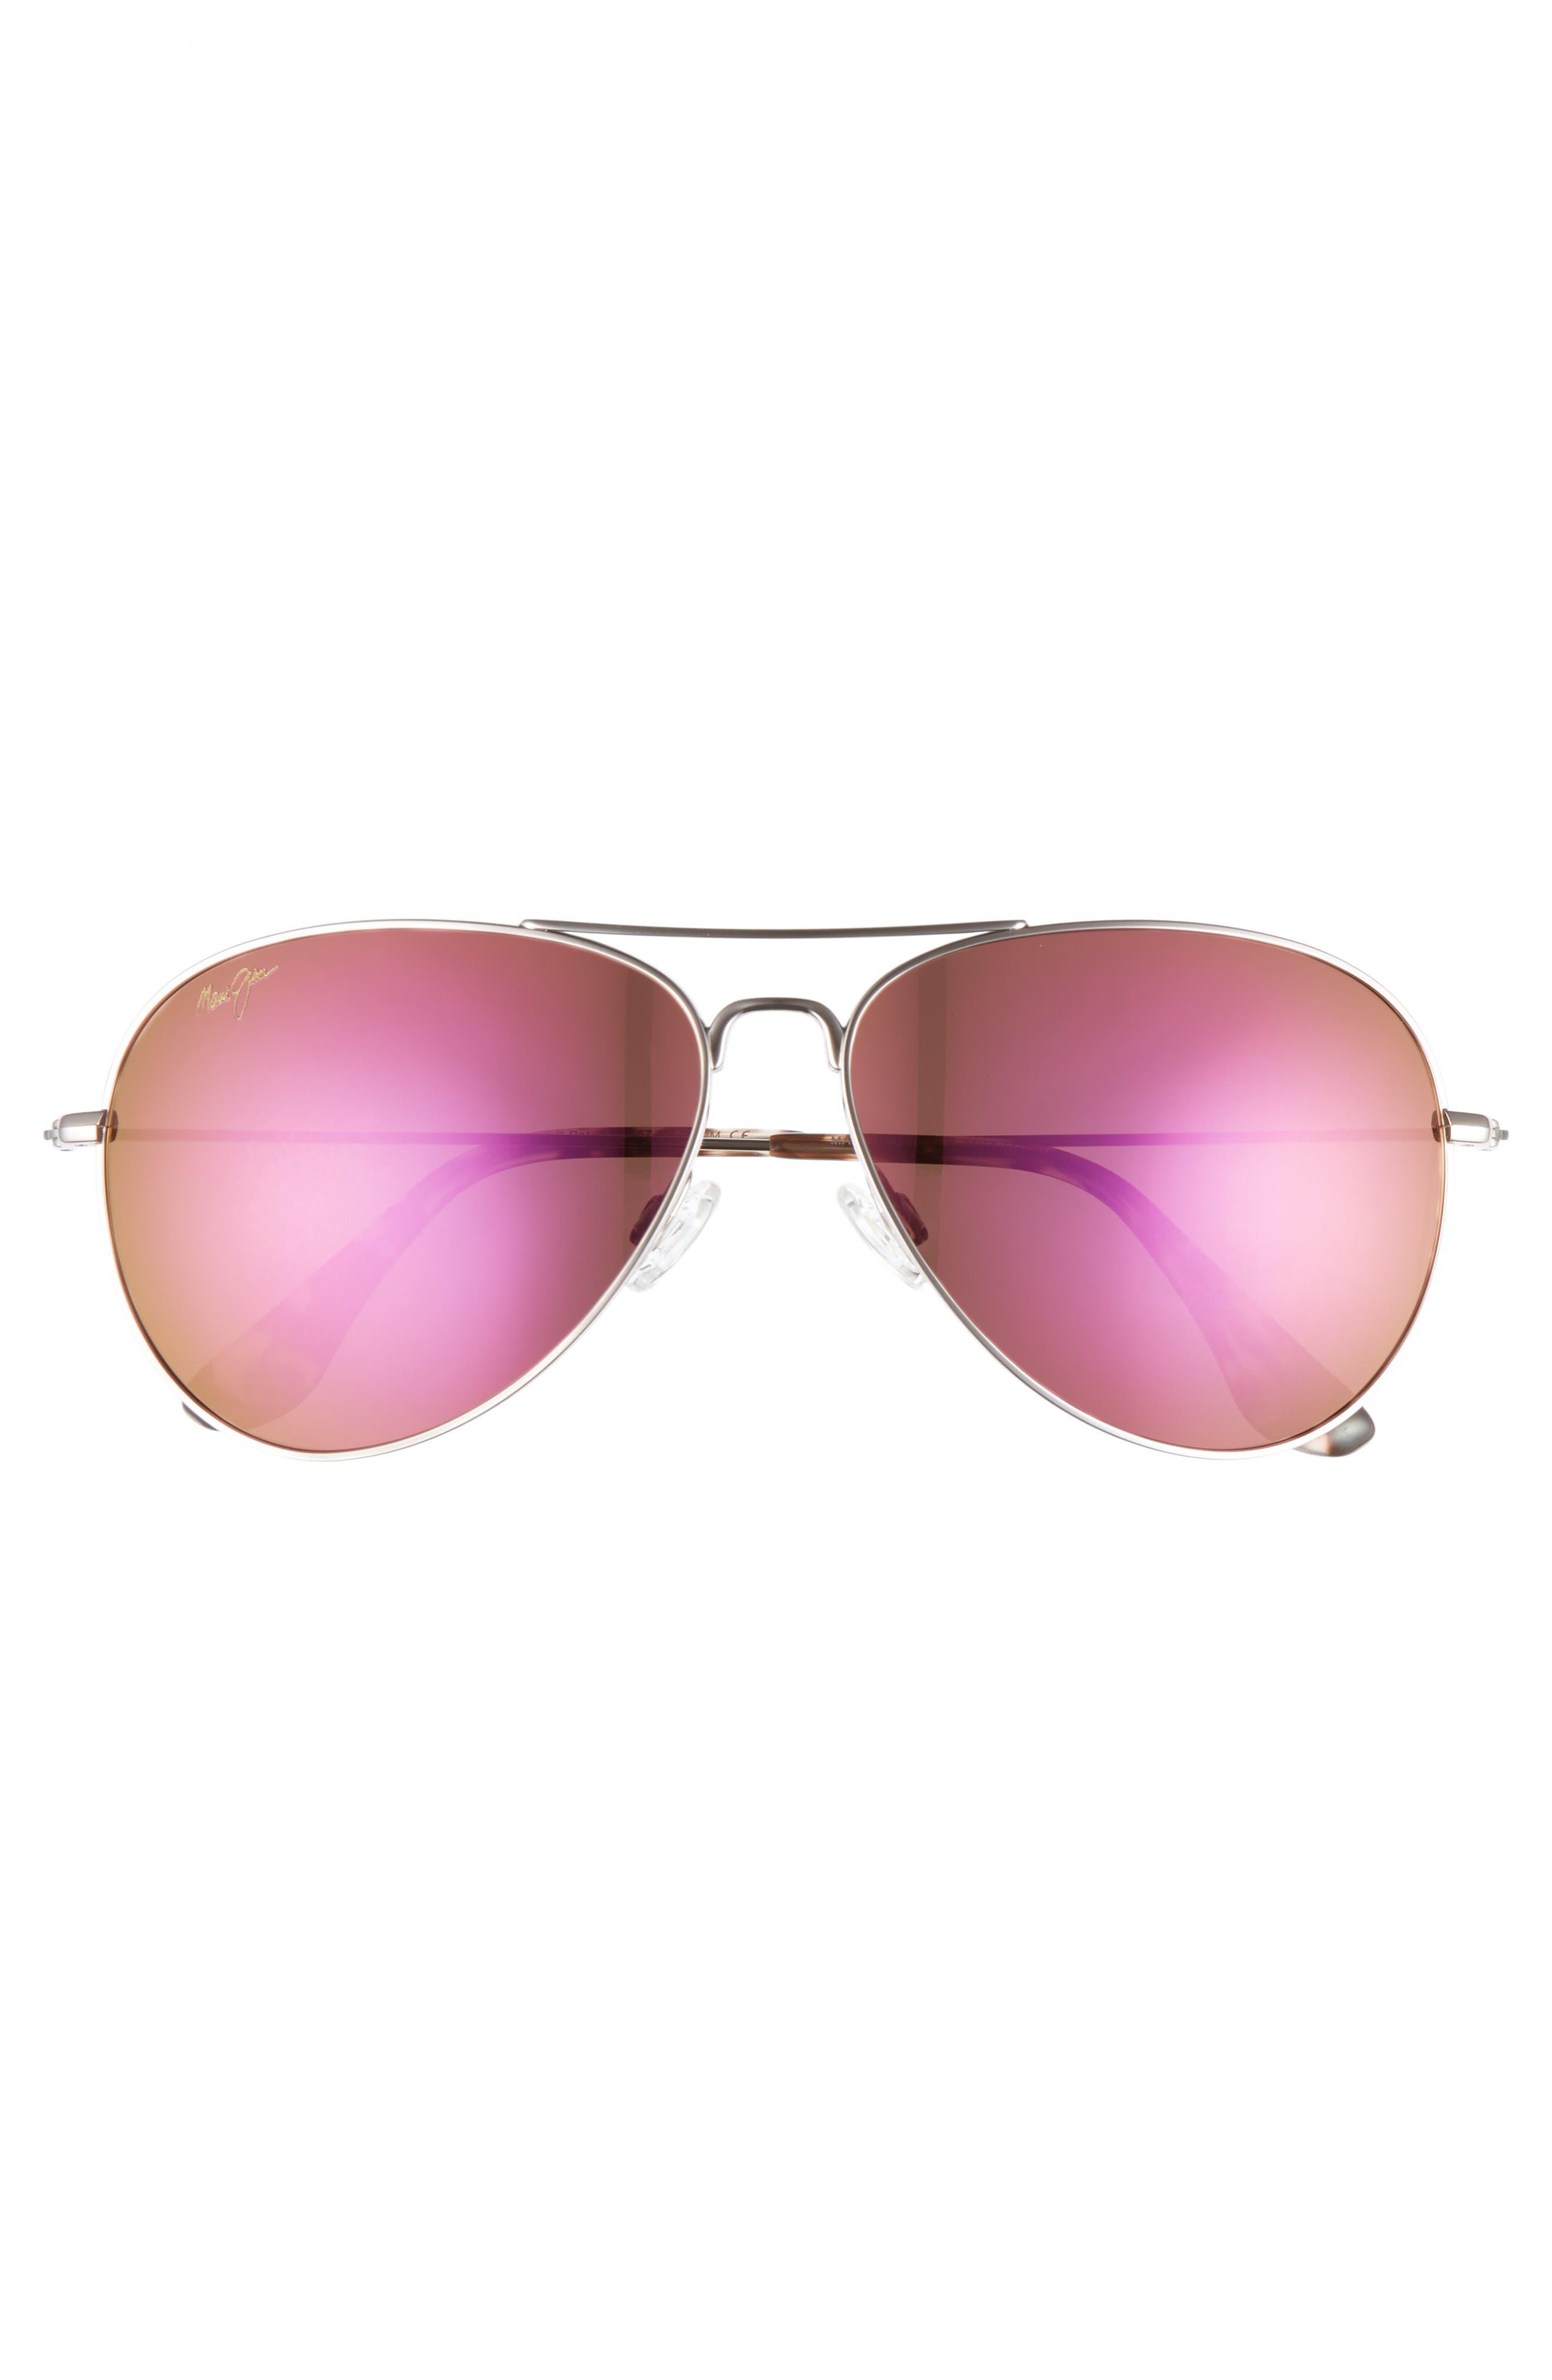 Mavericks 61mm PolarizedPlus2<sup>®</sup> Aviator Sunglasses,                             Alternate thumbnail 3, color,                             ROSE GOLD/ MAUI SUNRISE